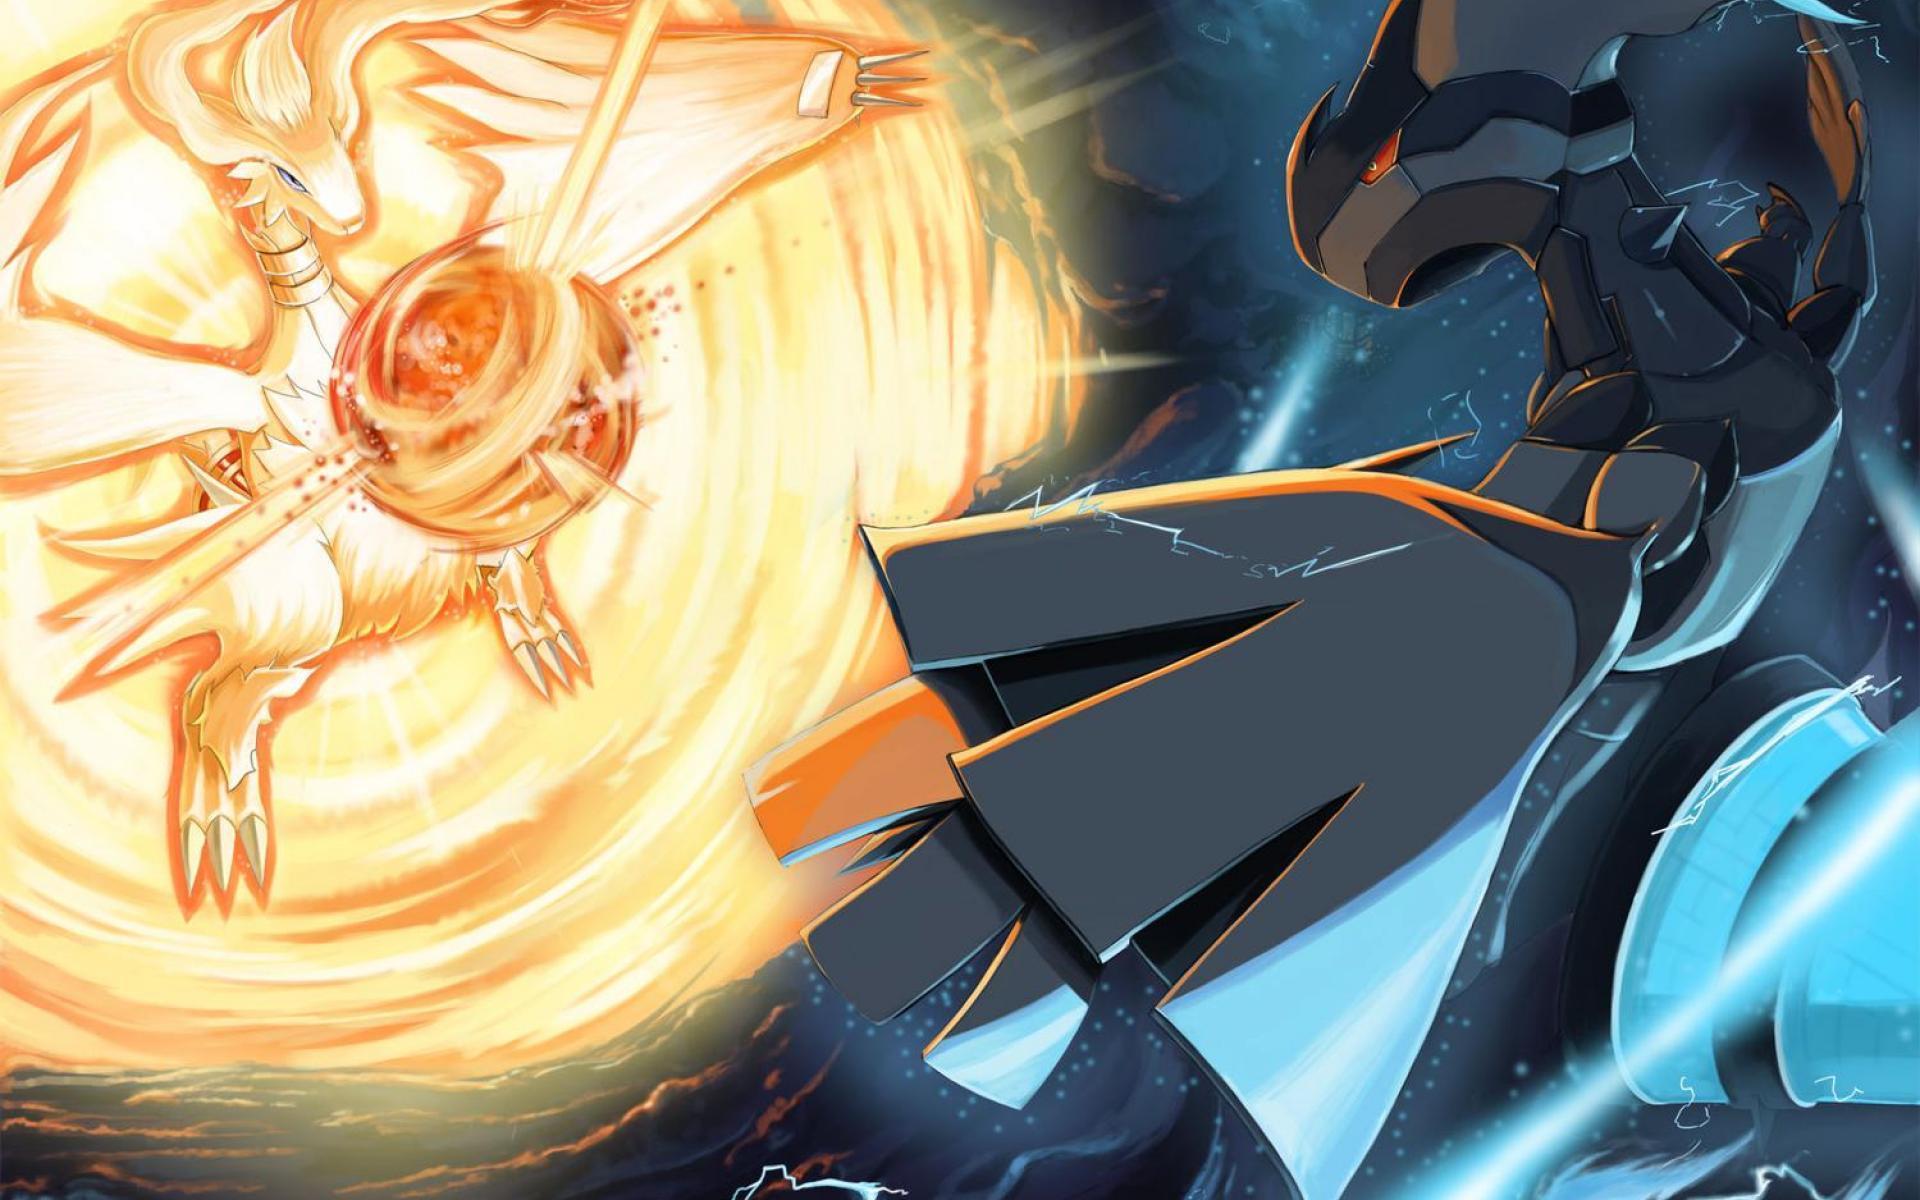 Epic Pokemon Battle Wallpapers Top Free Epic Pokemon Battle Backgrounds Wallpaperaccess